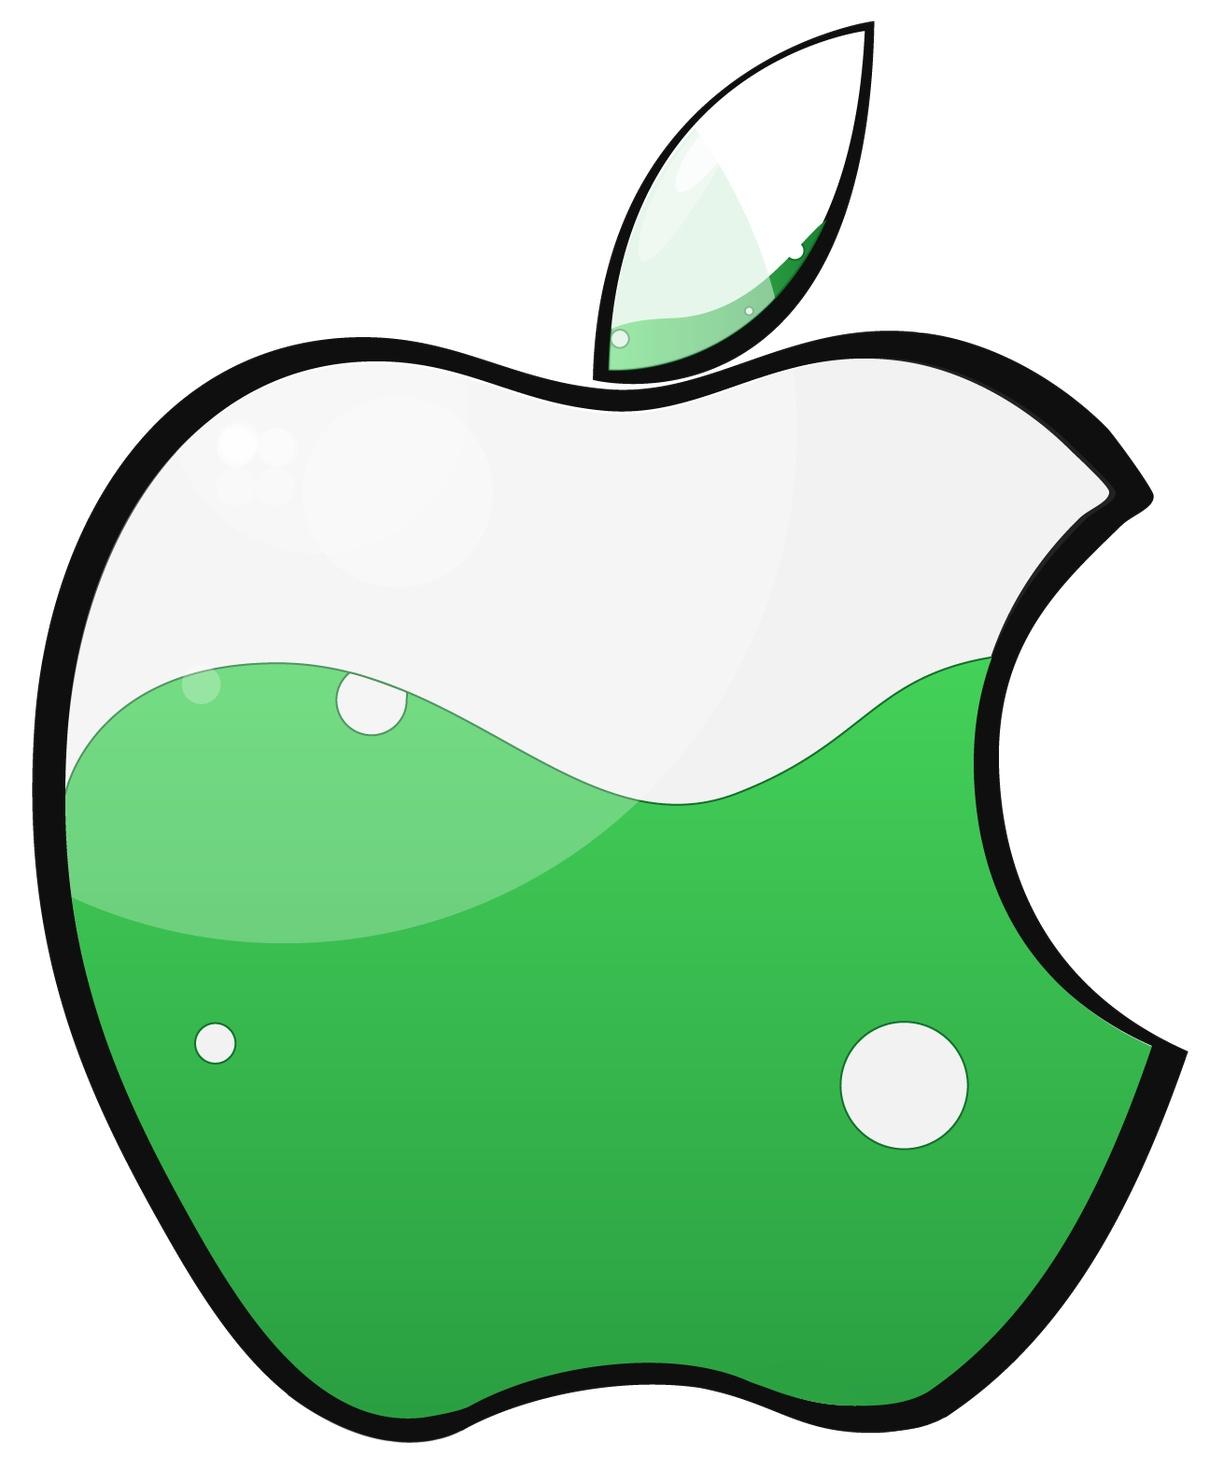 http://1.bp.blogspot.com/-PnHw10BGNyQ/TZzmlm_IELI/AAAAAAAAAt4/9ghmamkTN2U/s1600/apple-logo-wallpaper-greenpois0n-by-izacchemical.jpg